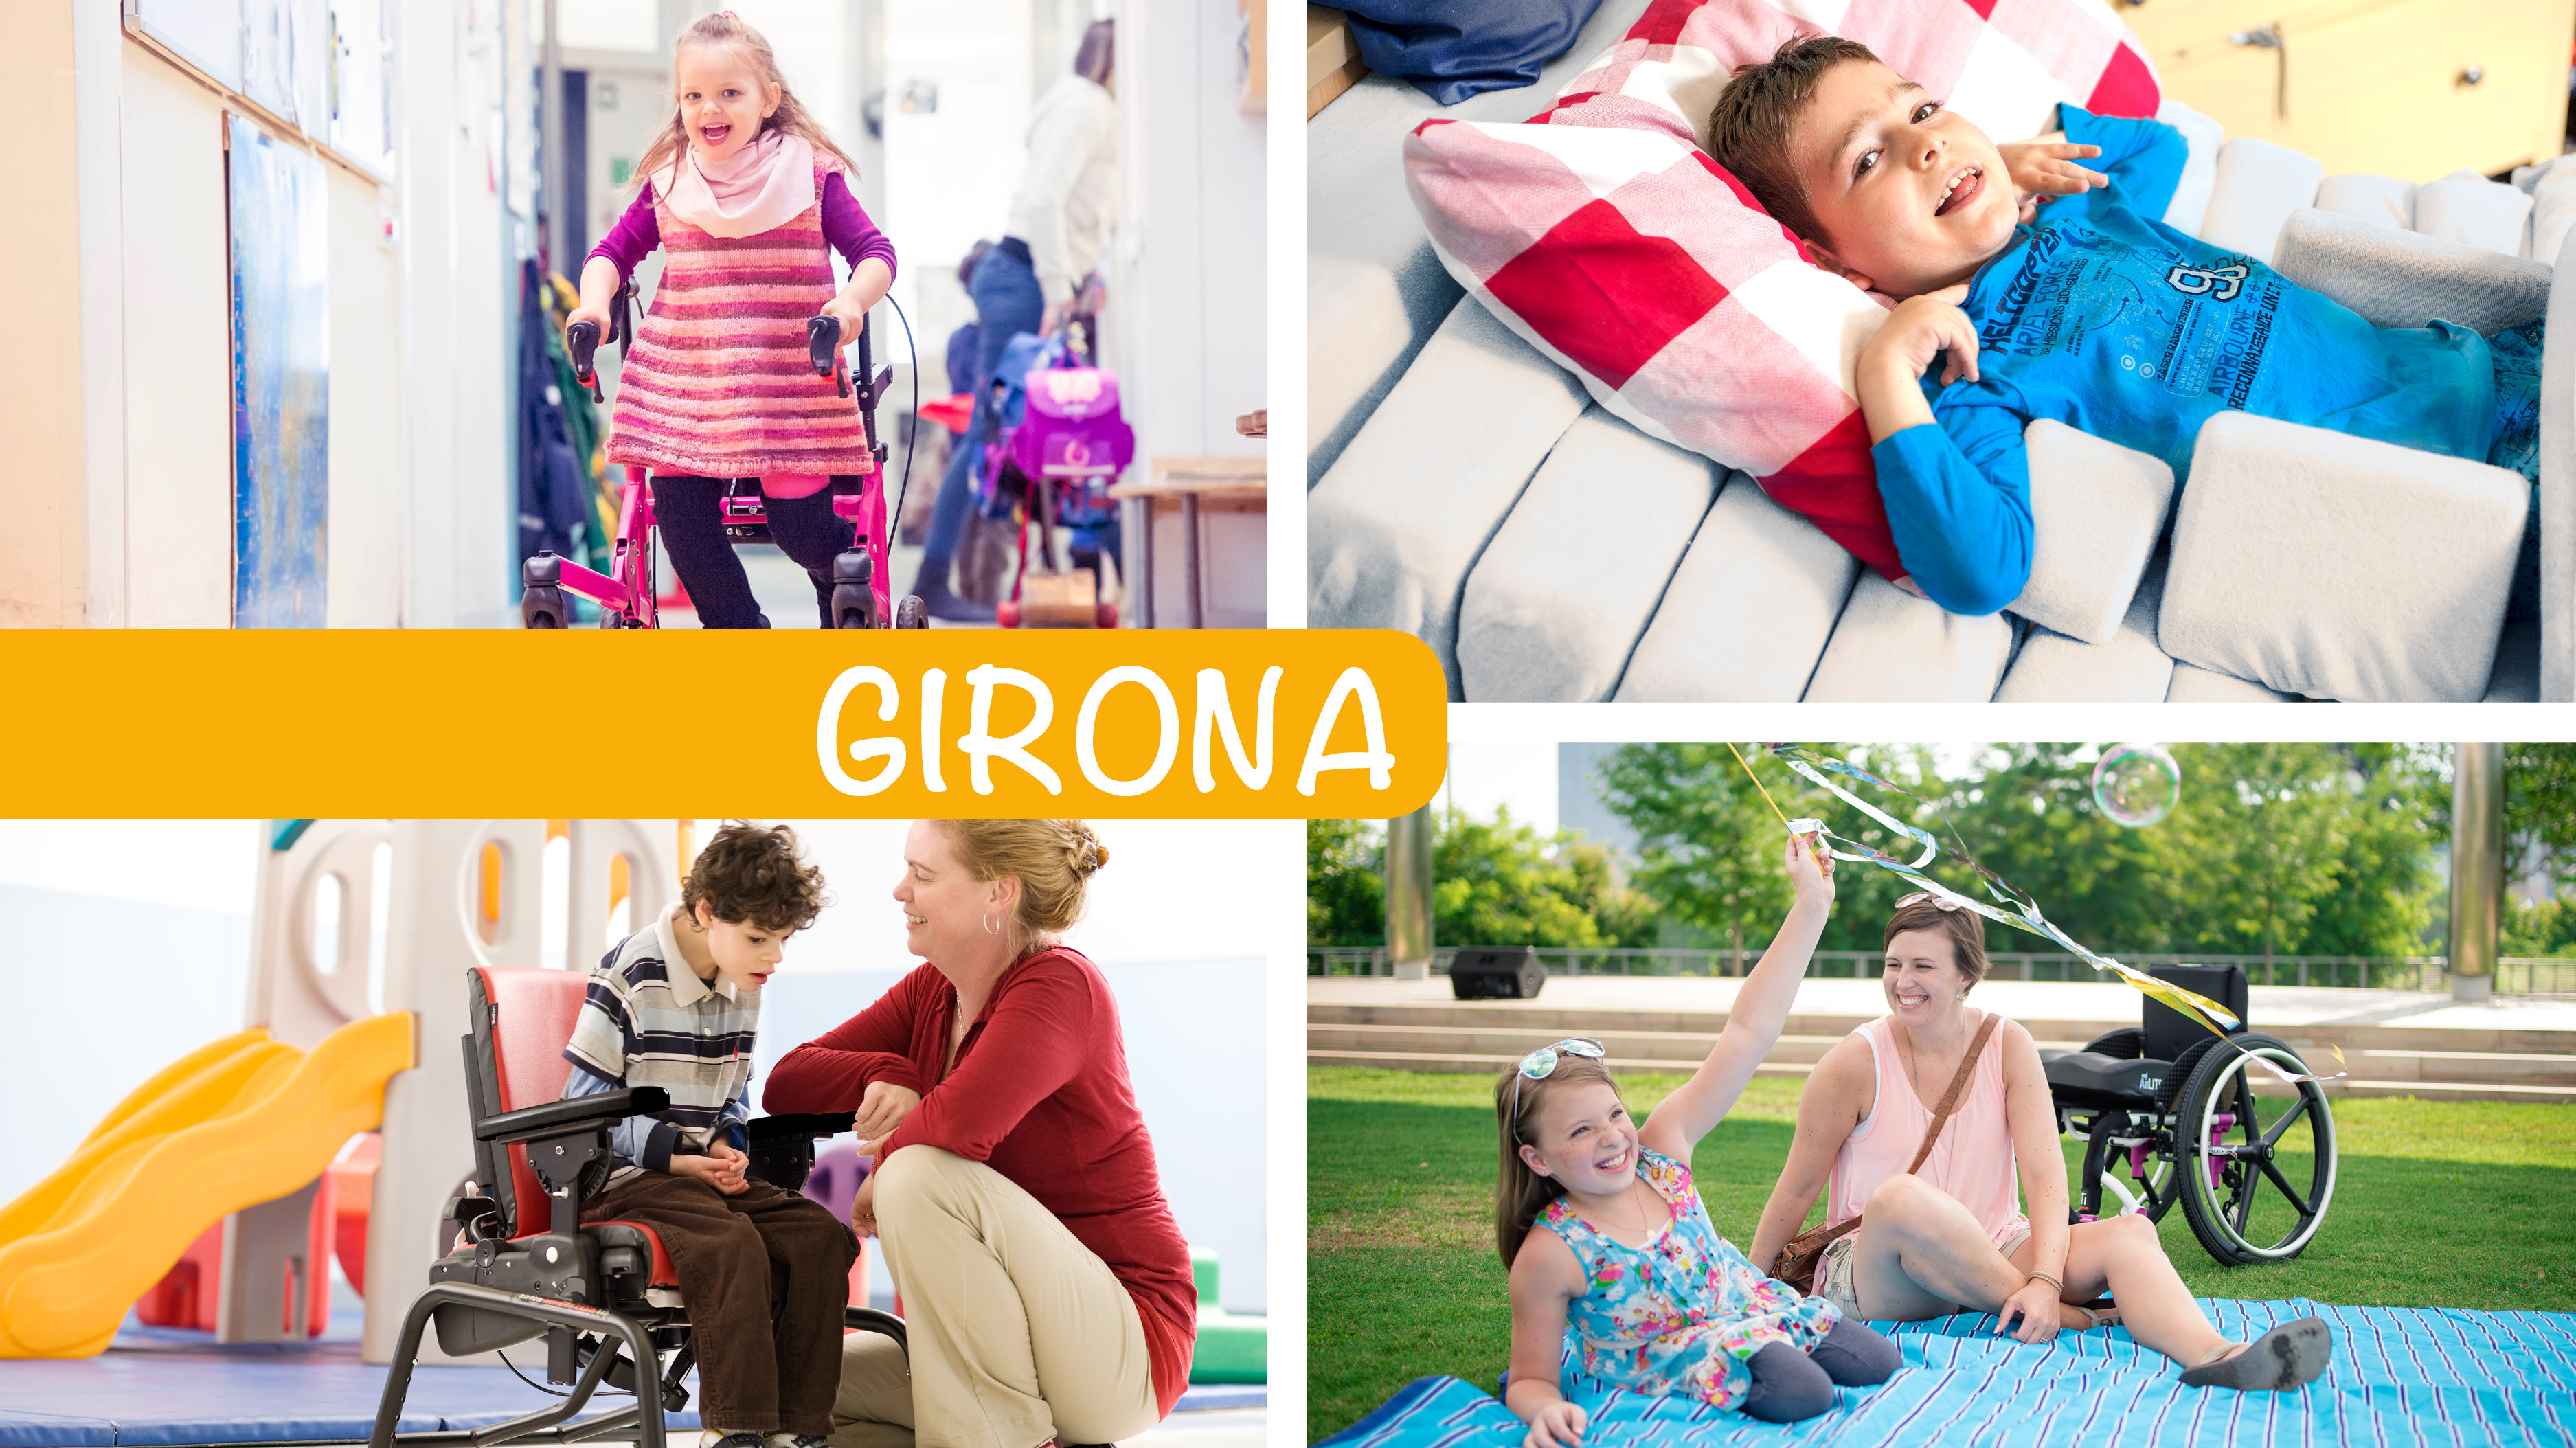 Girona acollirà el Rehacademia Family 24 hores, destinat a les famílies